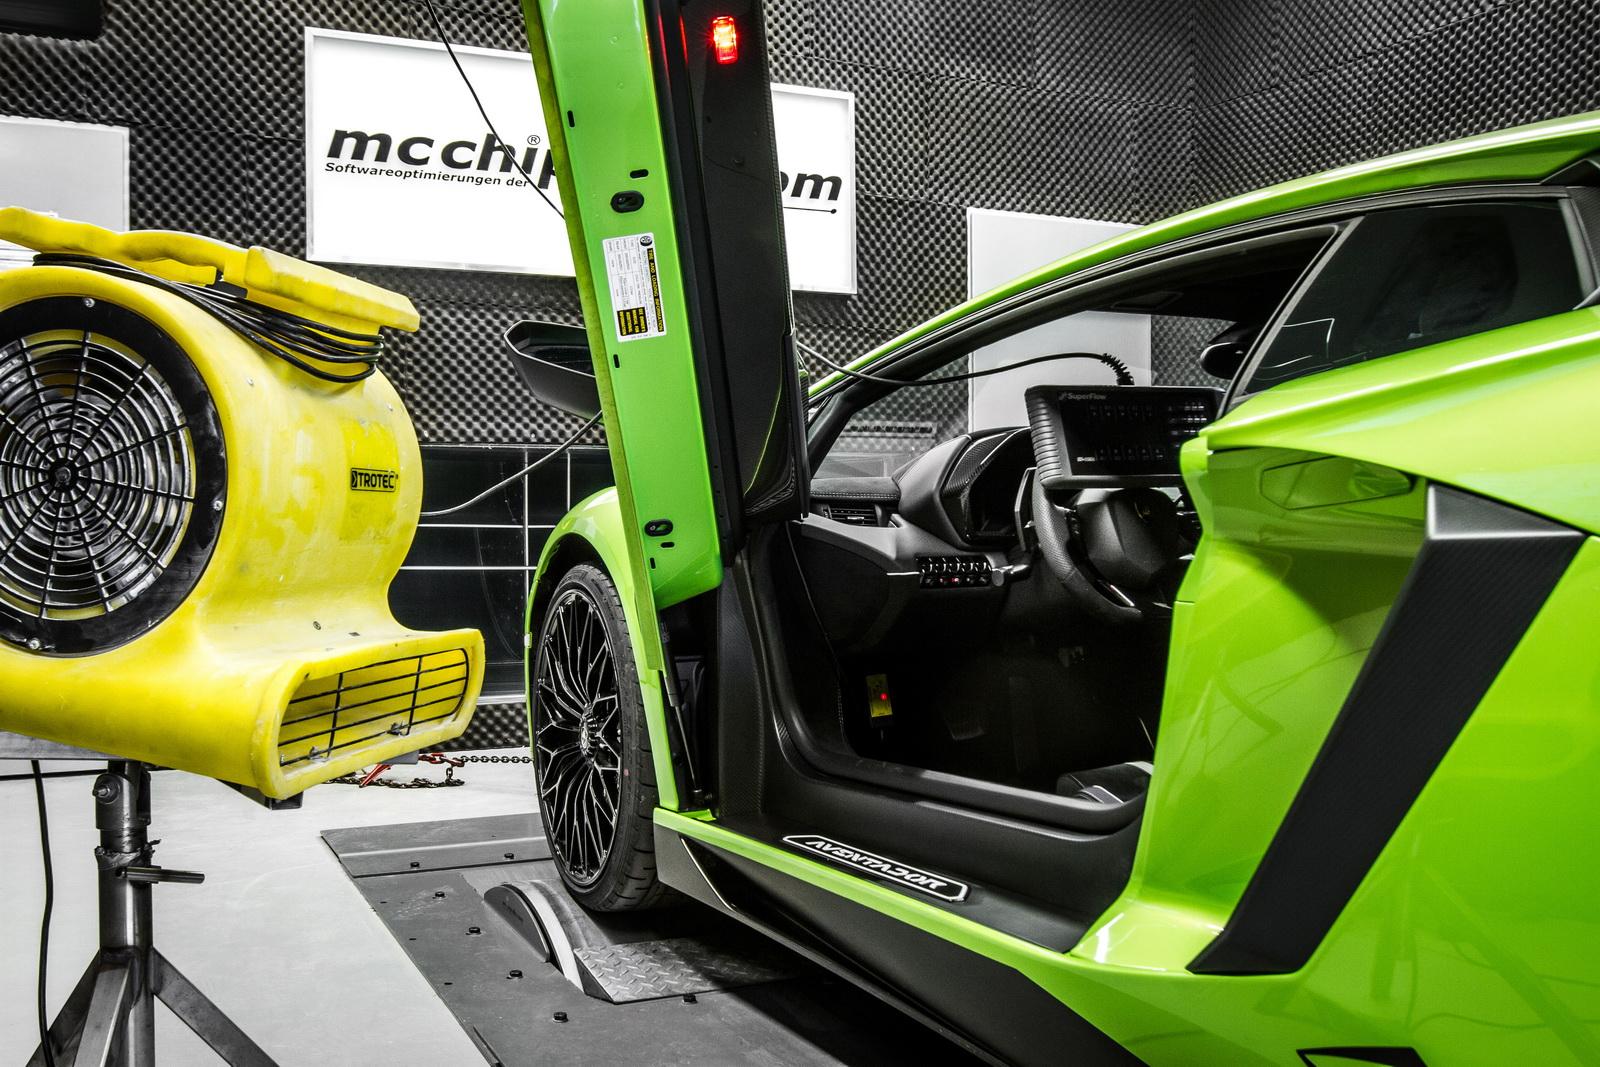 Lamborghini_Aventador_SV_by_Mcchip-DKR_15